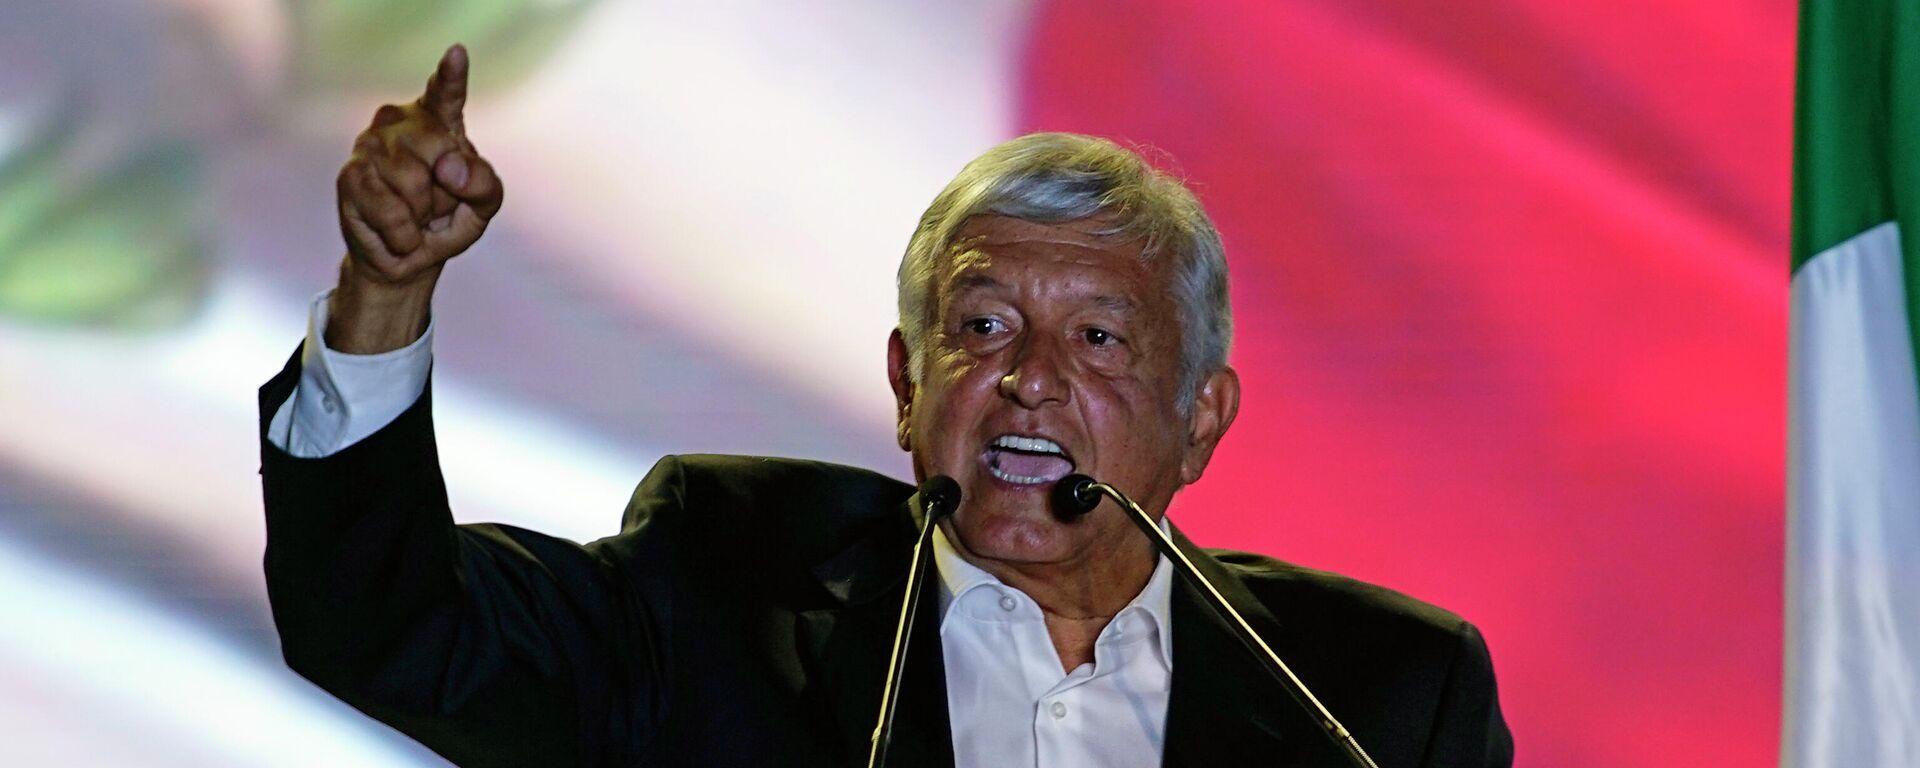 El presidente de México, Andrés Manuel López Obrador - Sputnik Mundo, 1920, 01.10.2021